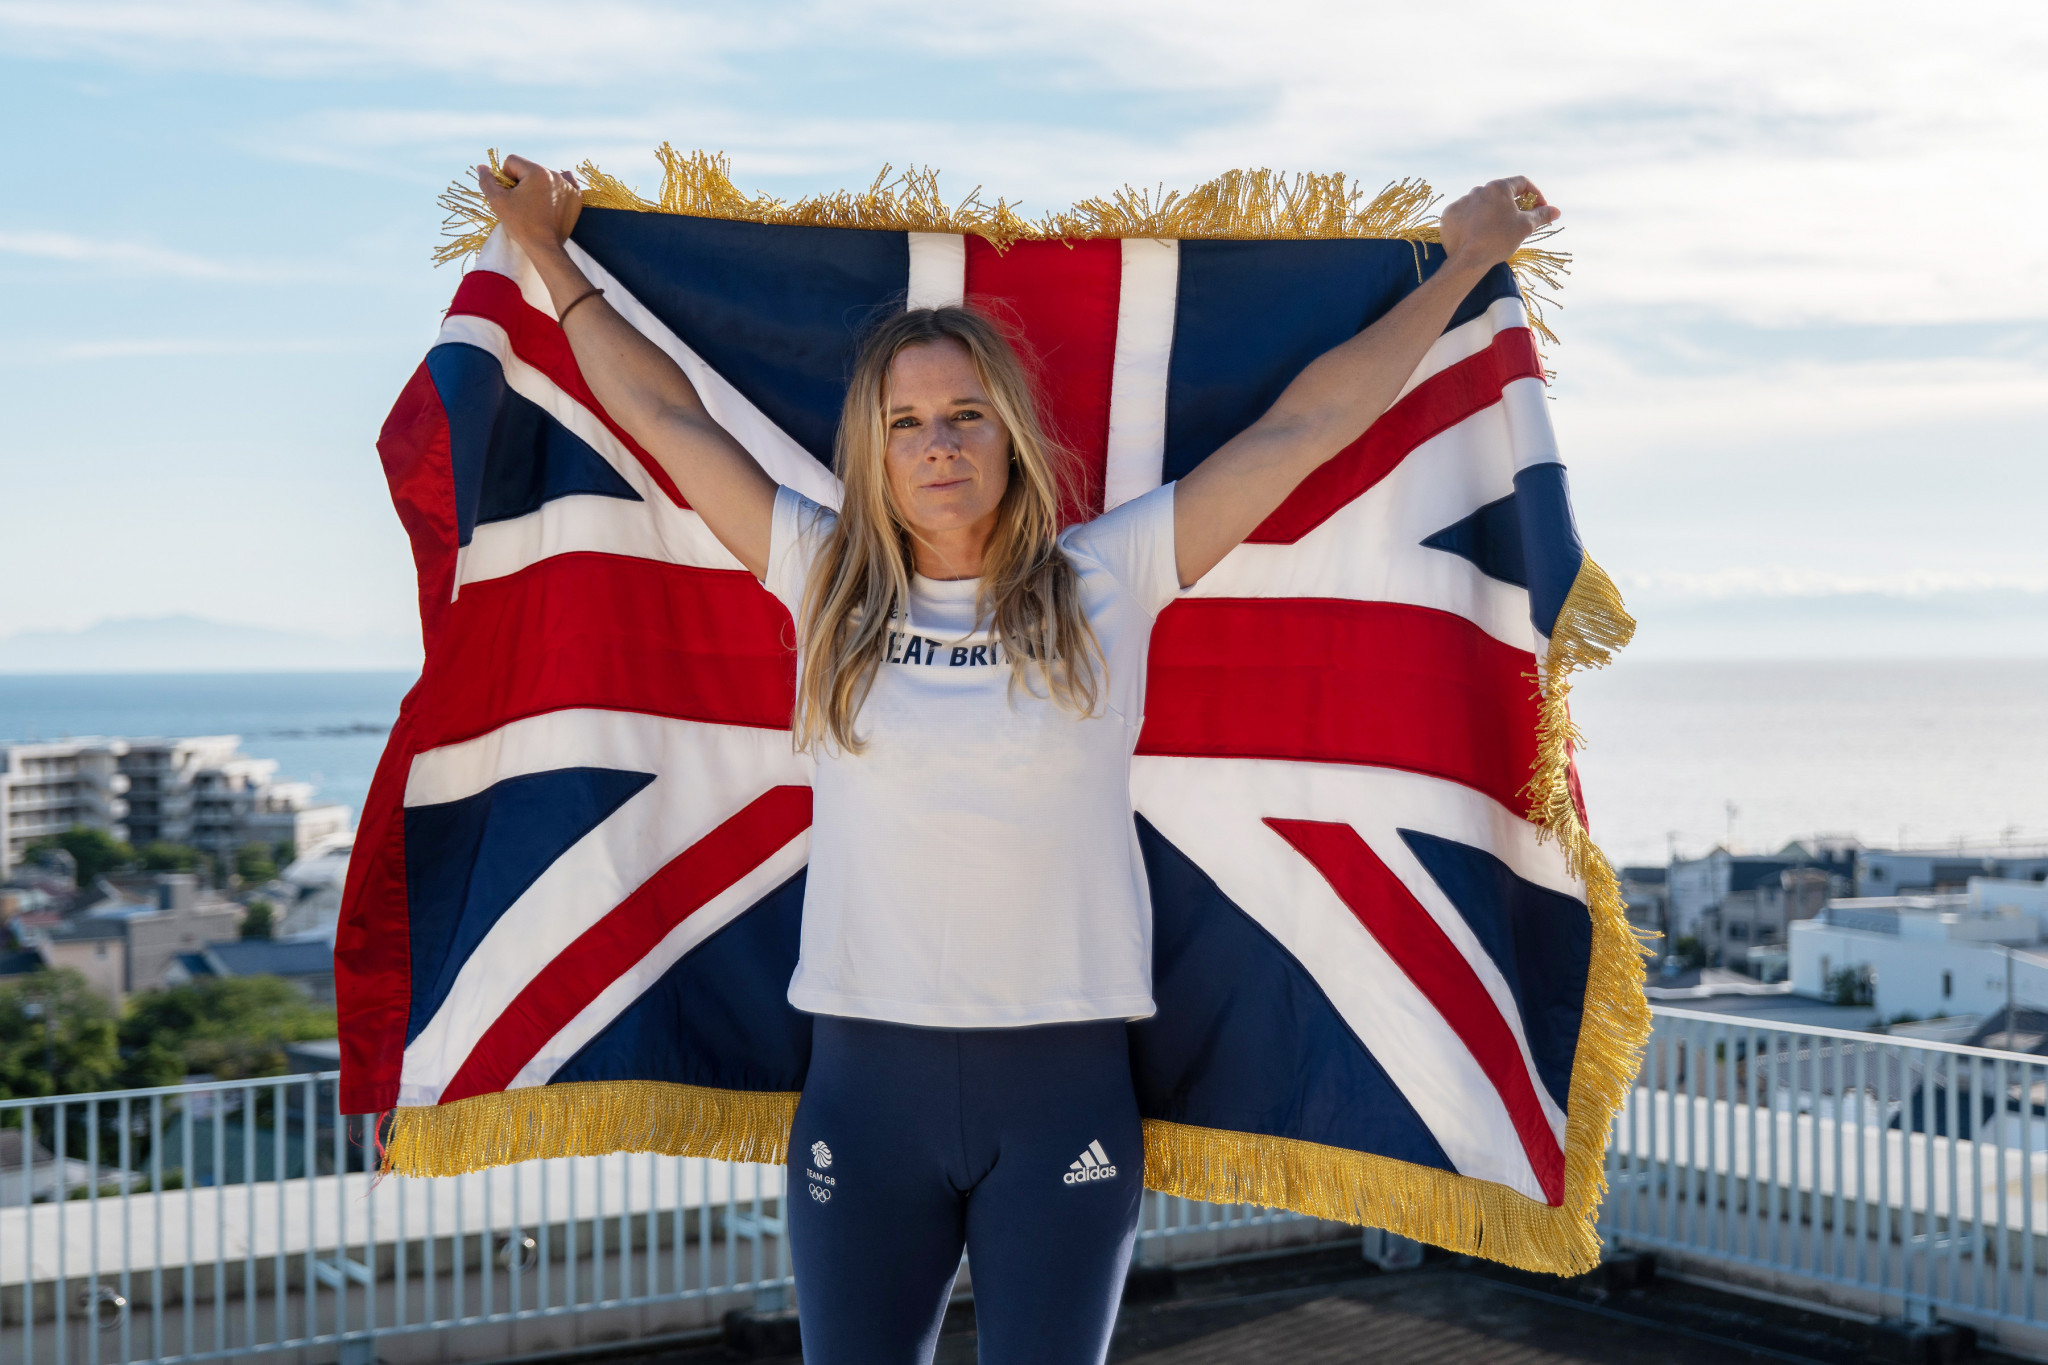 Sailor Hannah Mills has been chosen as one of two British flagbearers ©Sam Mellish/Team GB